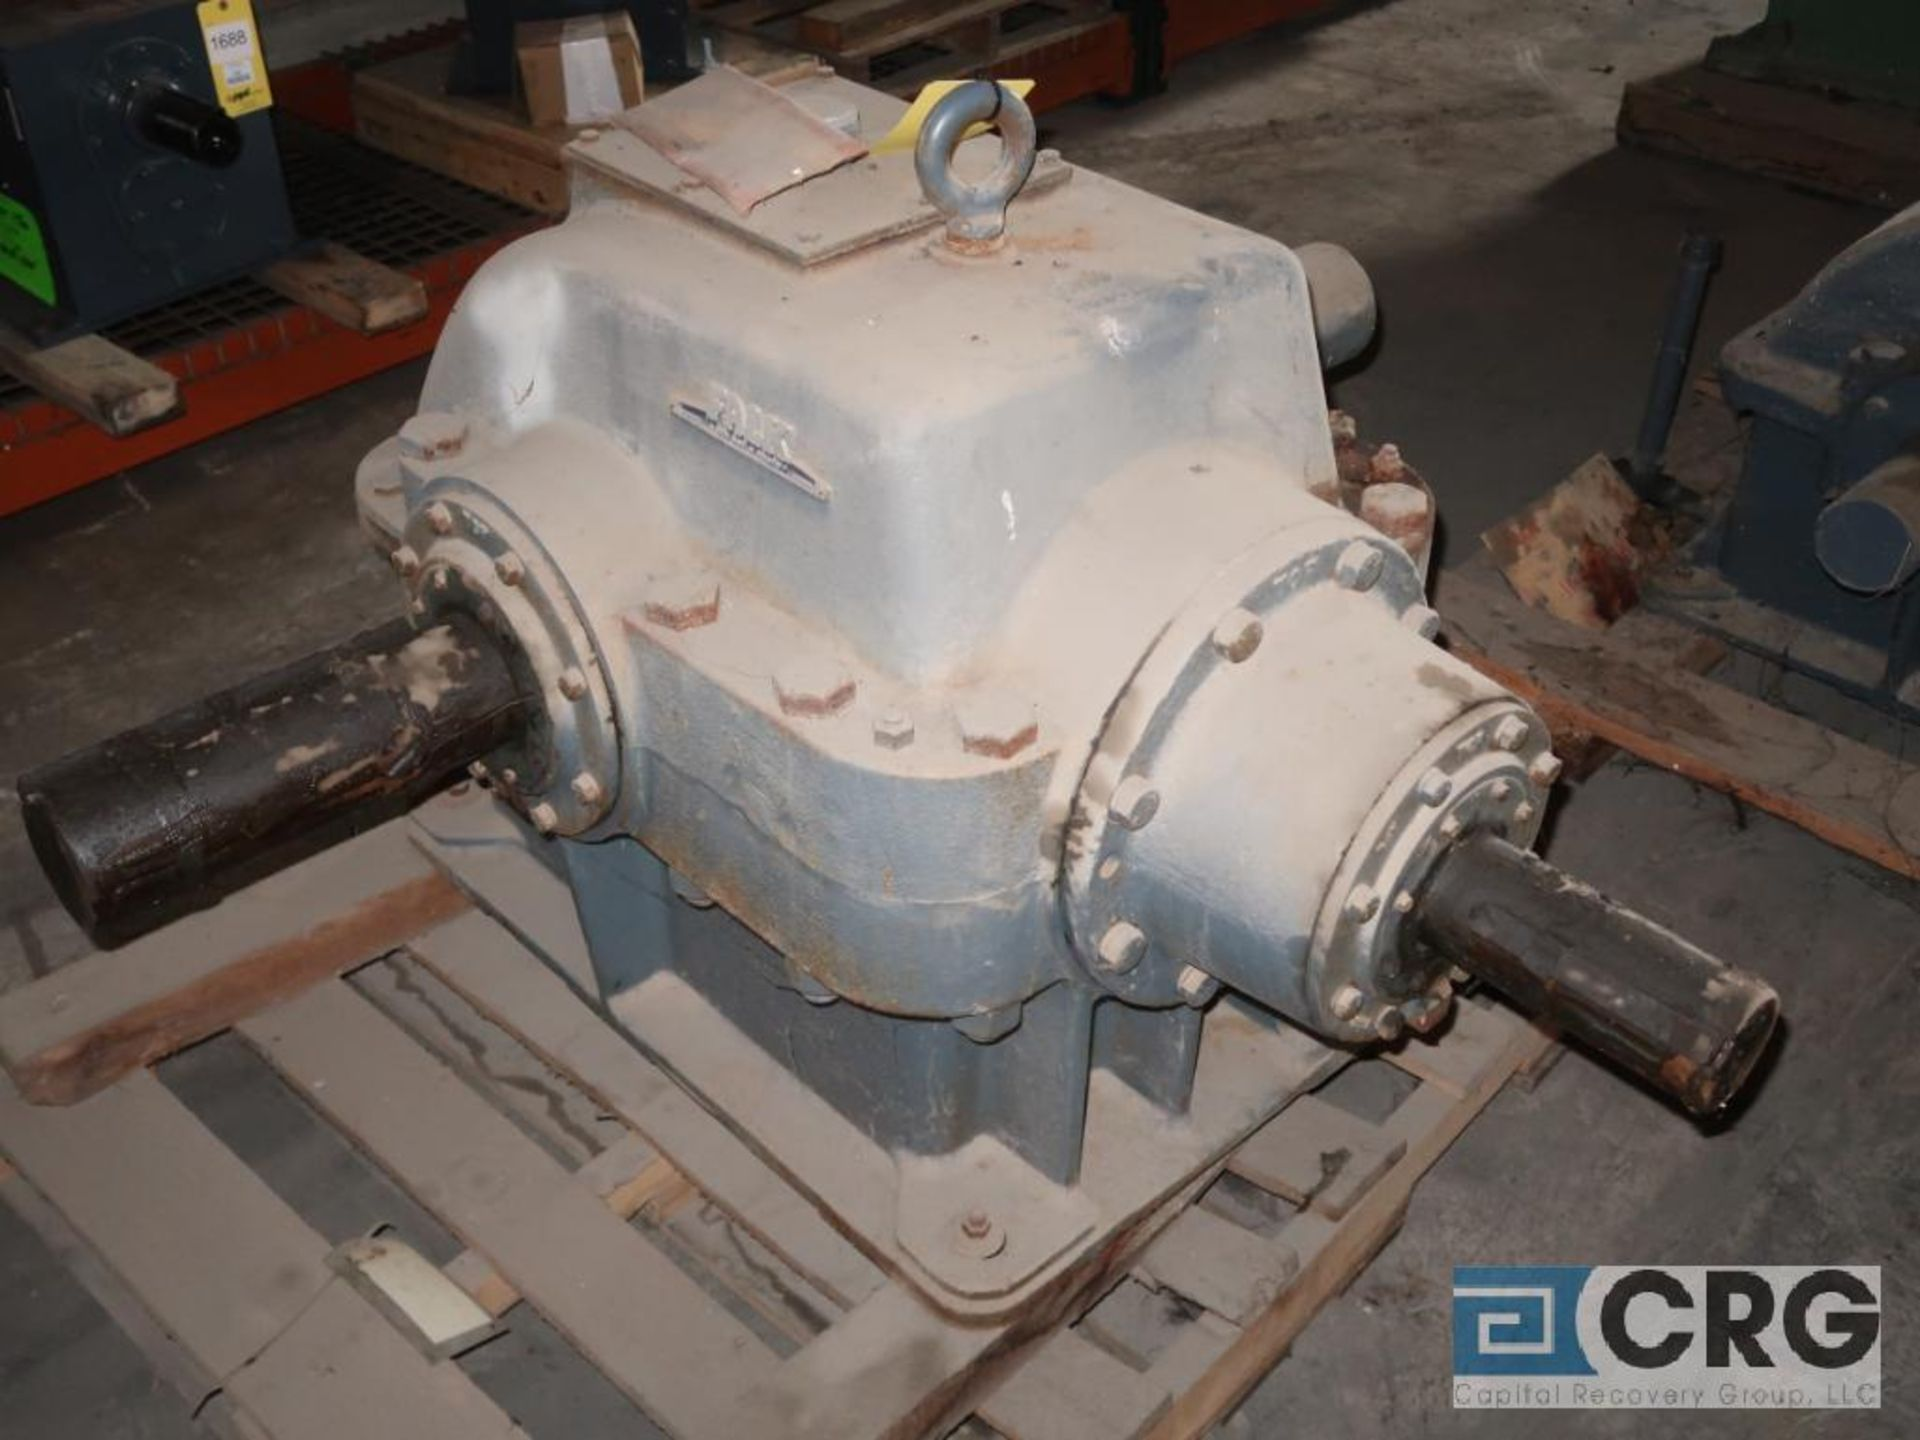 Falk 2100 GH81 KS gear drive, ratio-2.455, input RPM 403, output RPM 164, service rate HP. 232, s/ - Image 2 of 3